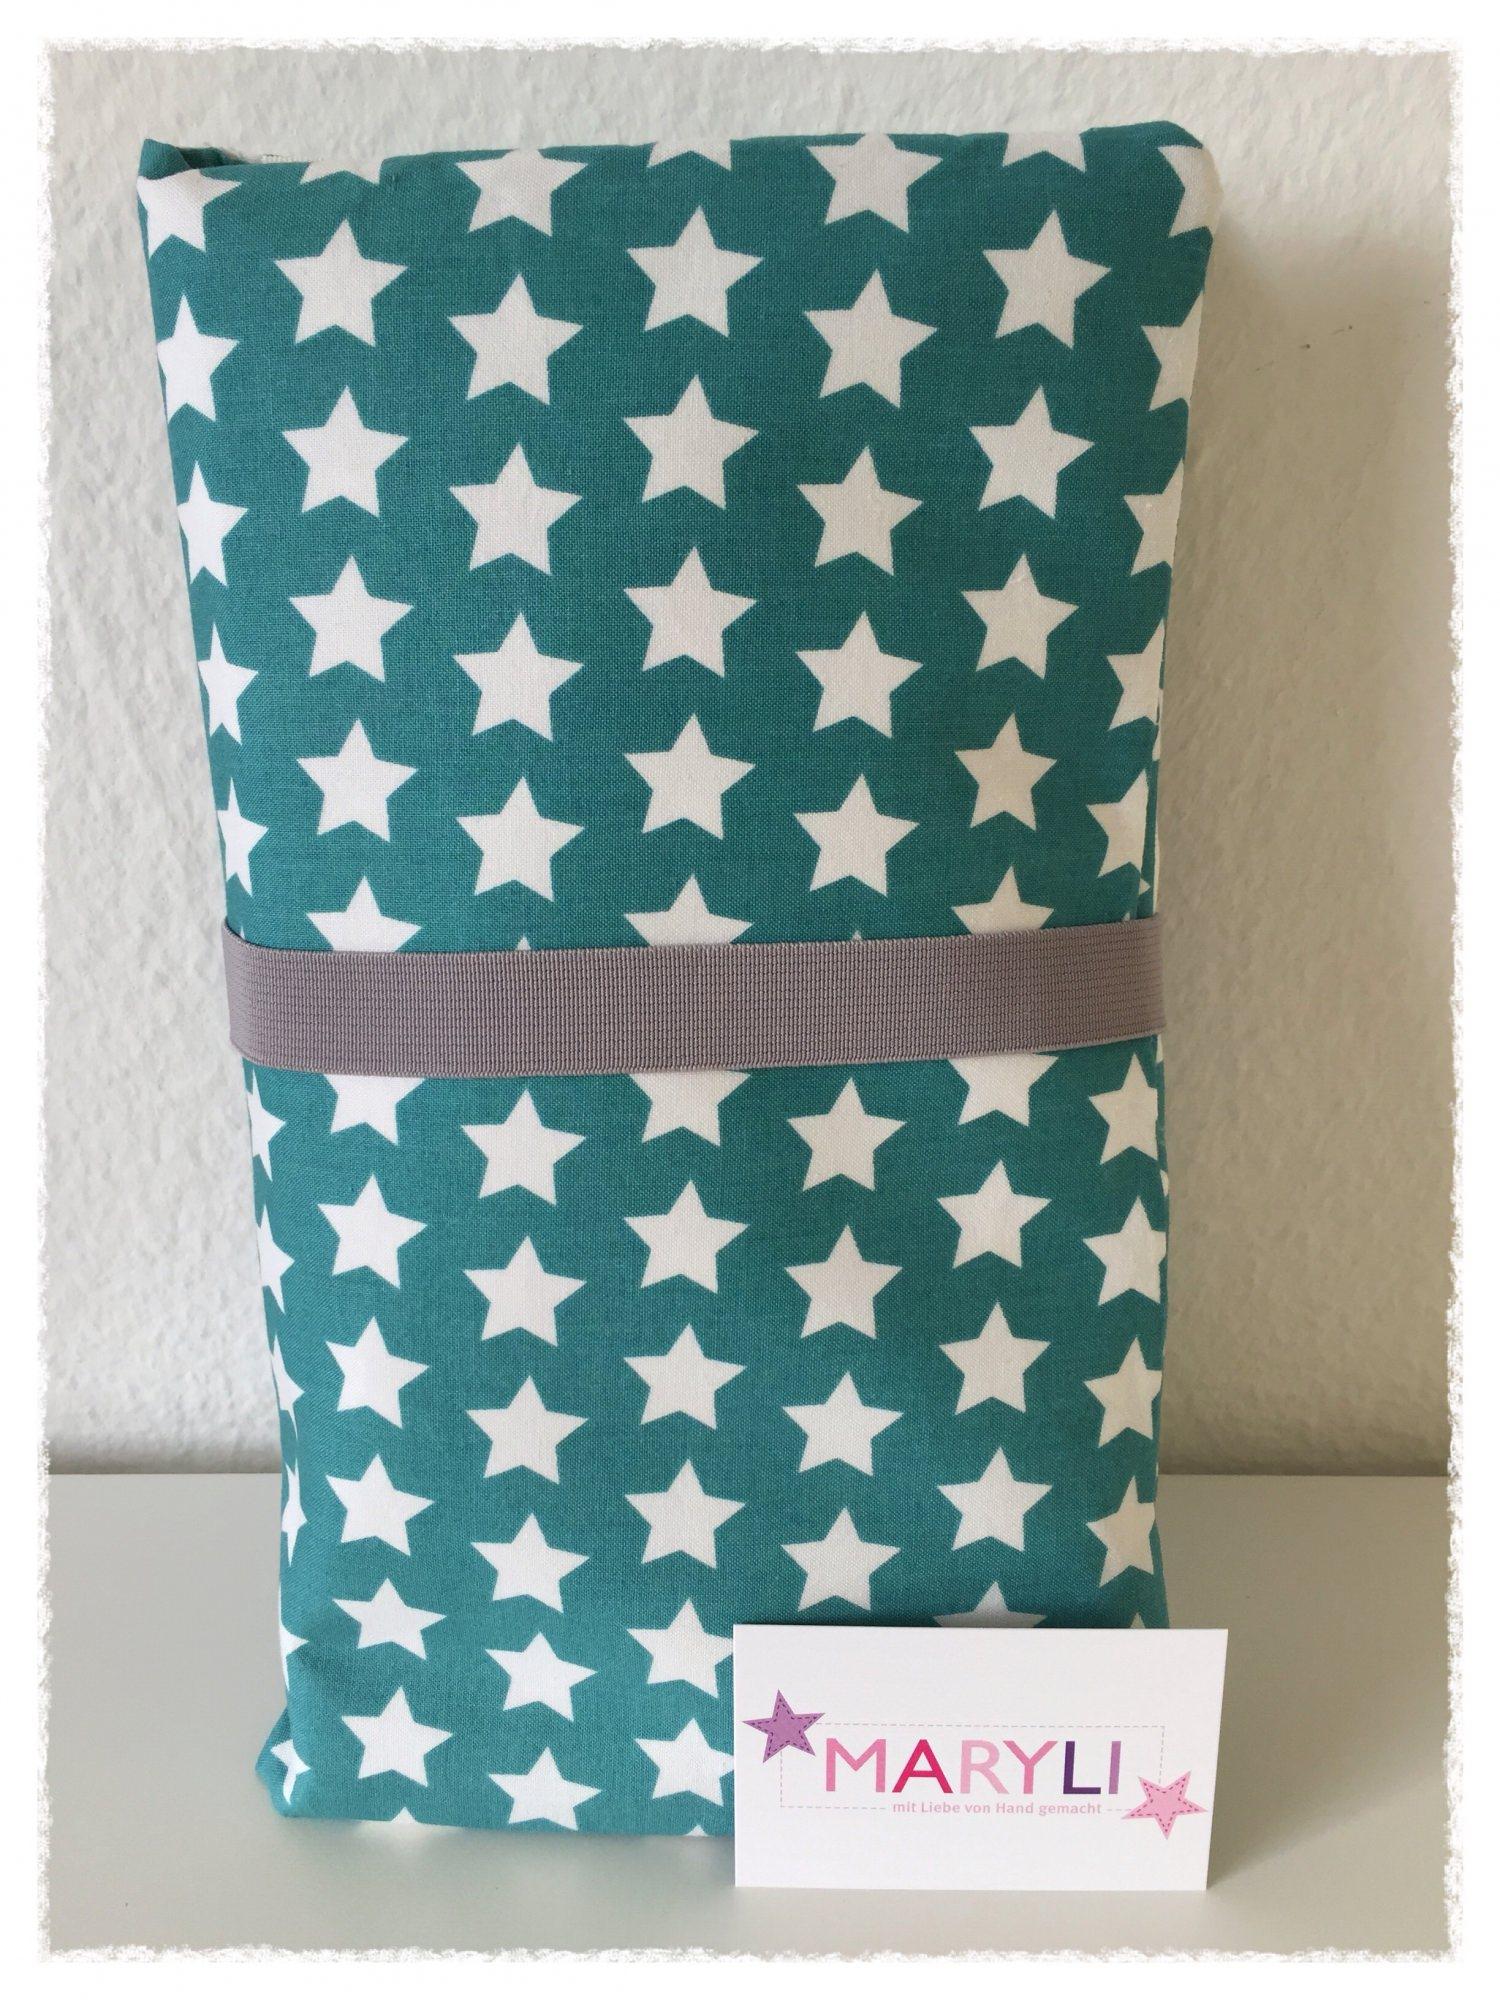 - Wickeltasche mit Sternen - Wickeltasche mit Sternen